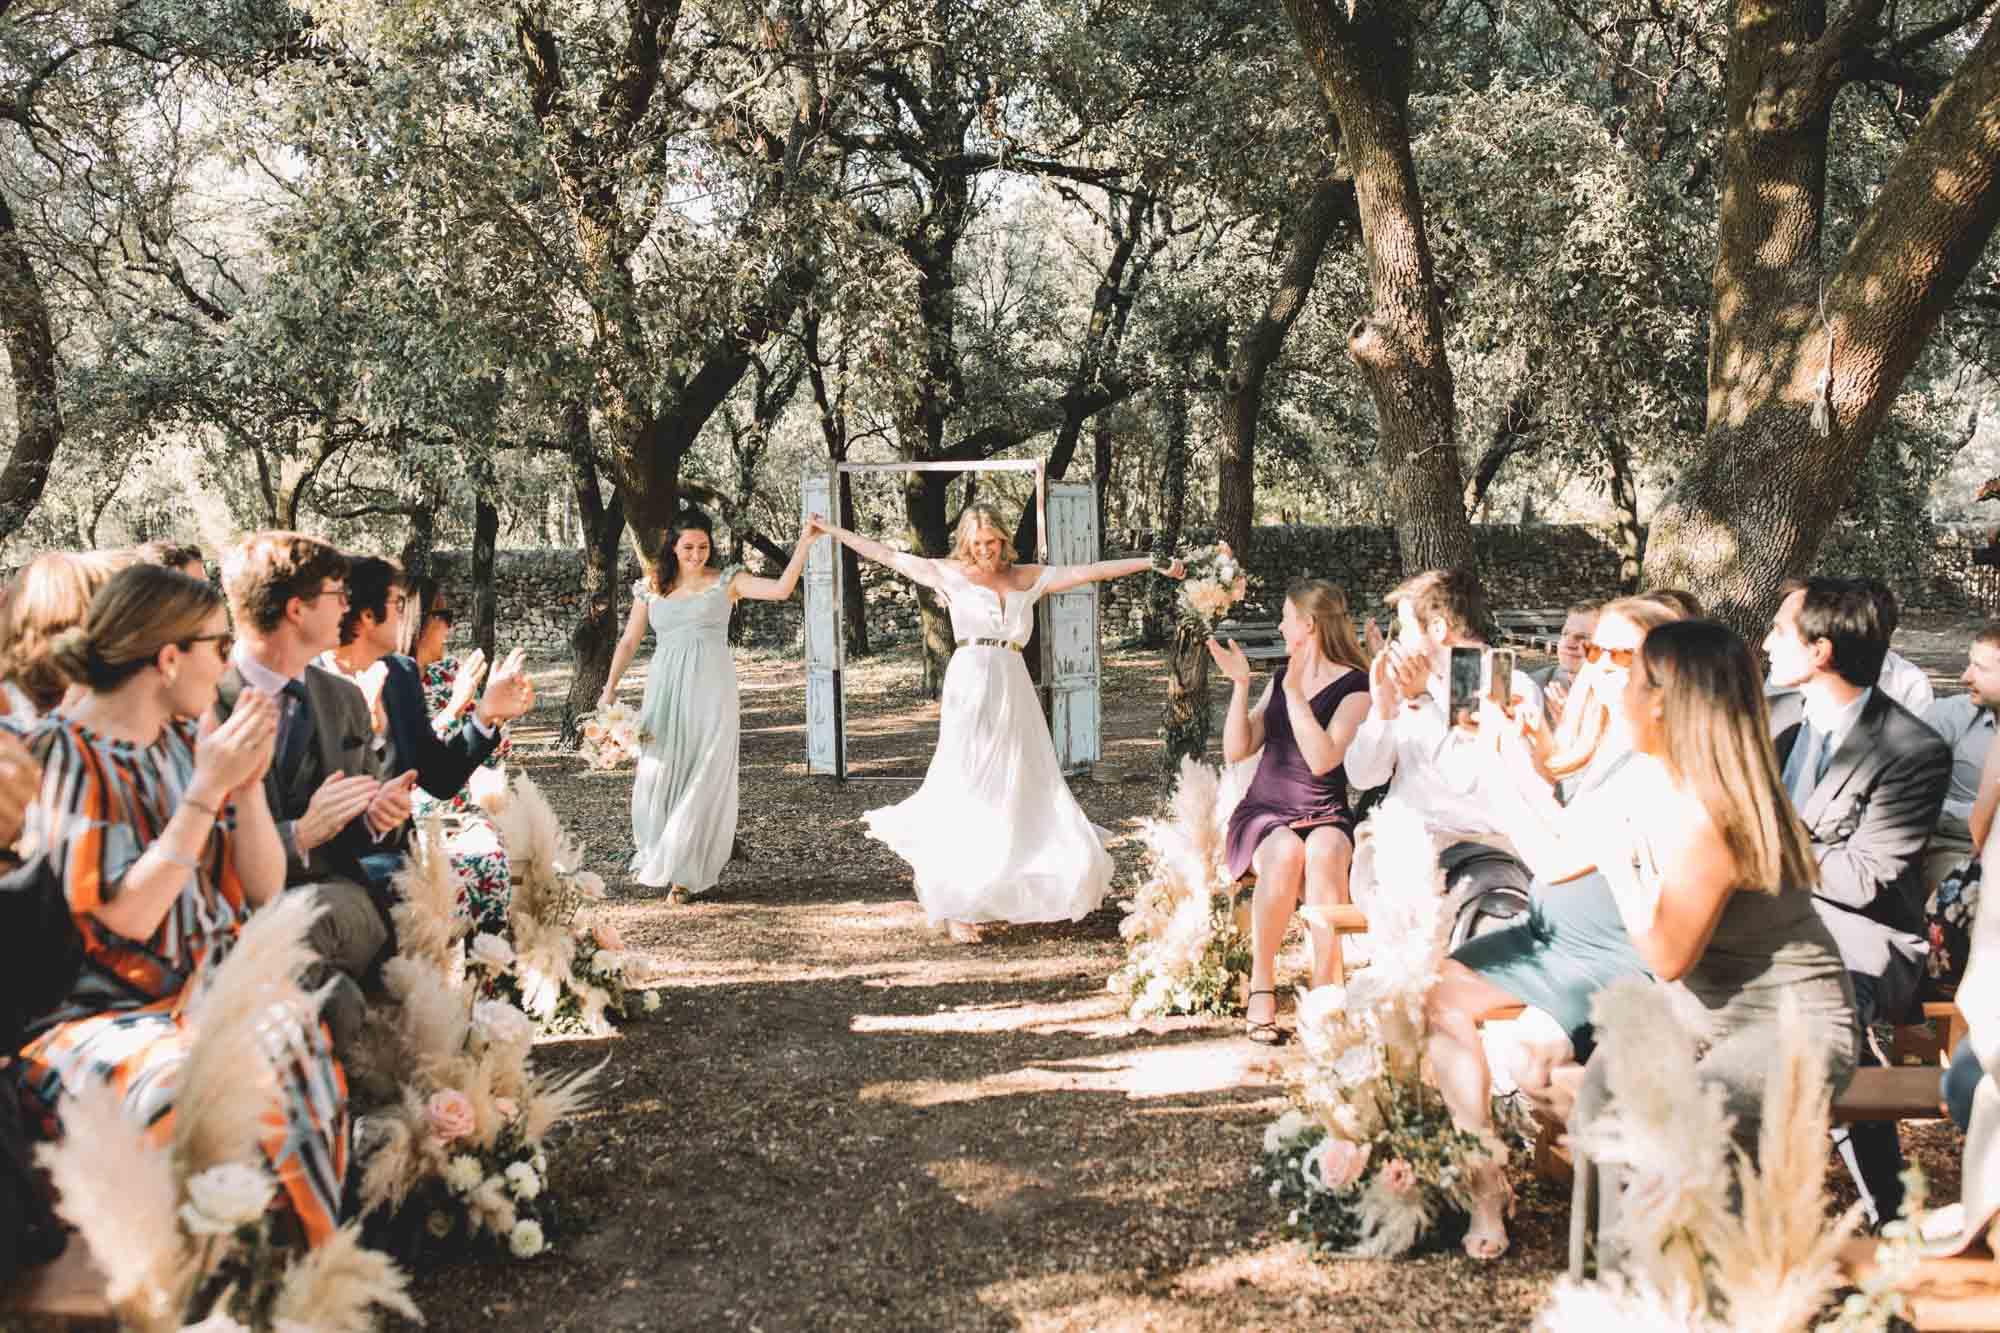 KATHARINA + DIMITRI_DOMAINES DE PATRAS_PHOTOGRAPHE MARIAGE_LES BANDITS-3